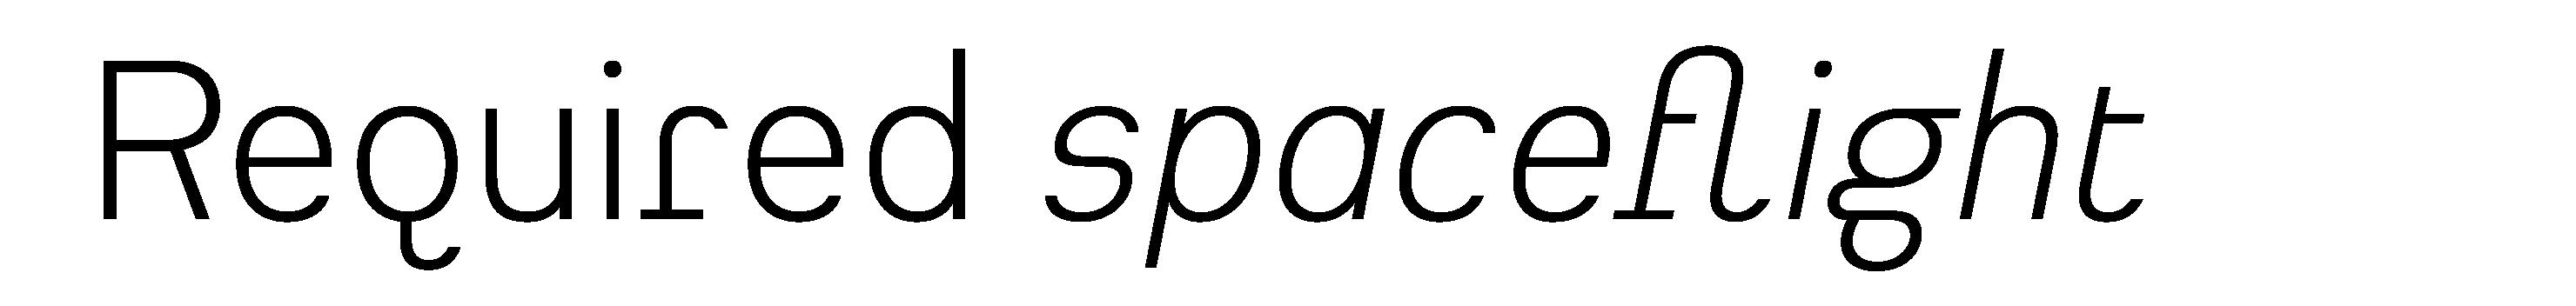 Typeface Heimat Sans D02 Atlas Font Foundry